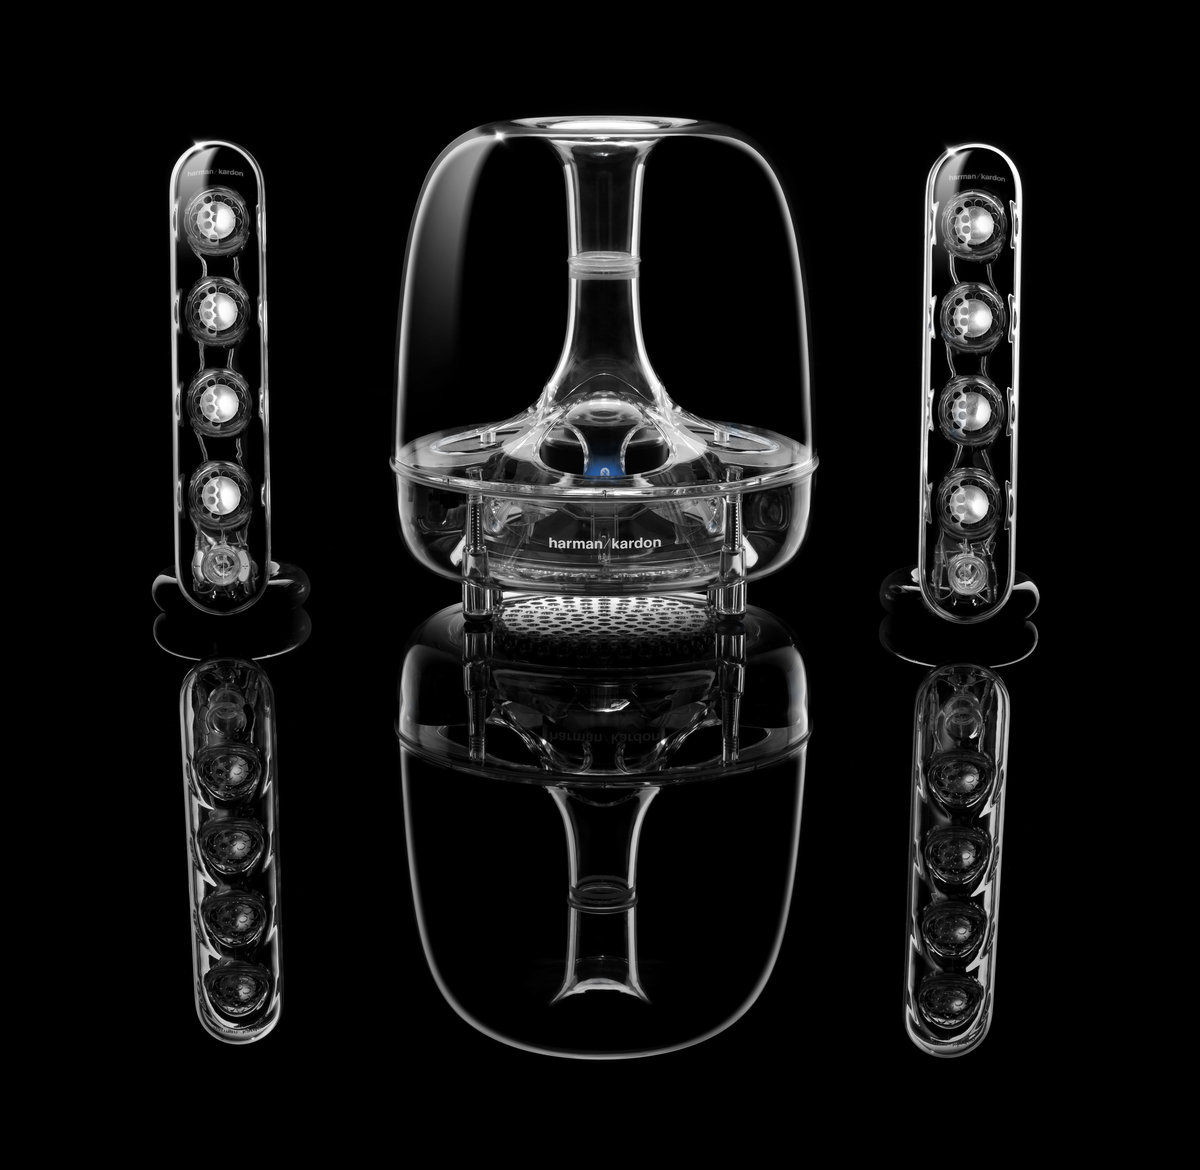 Soundsticks Wireless Speaker